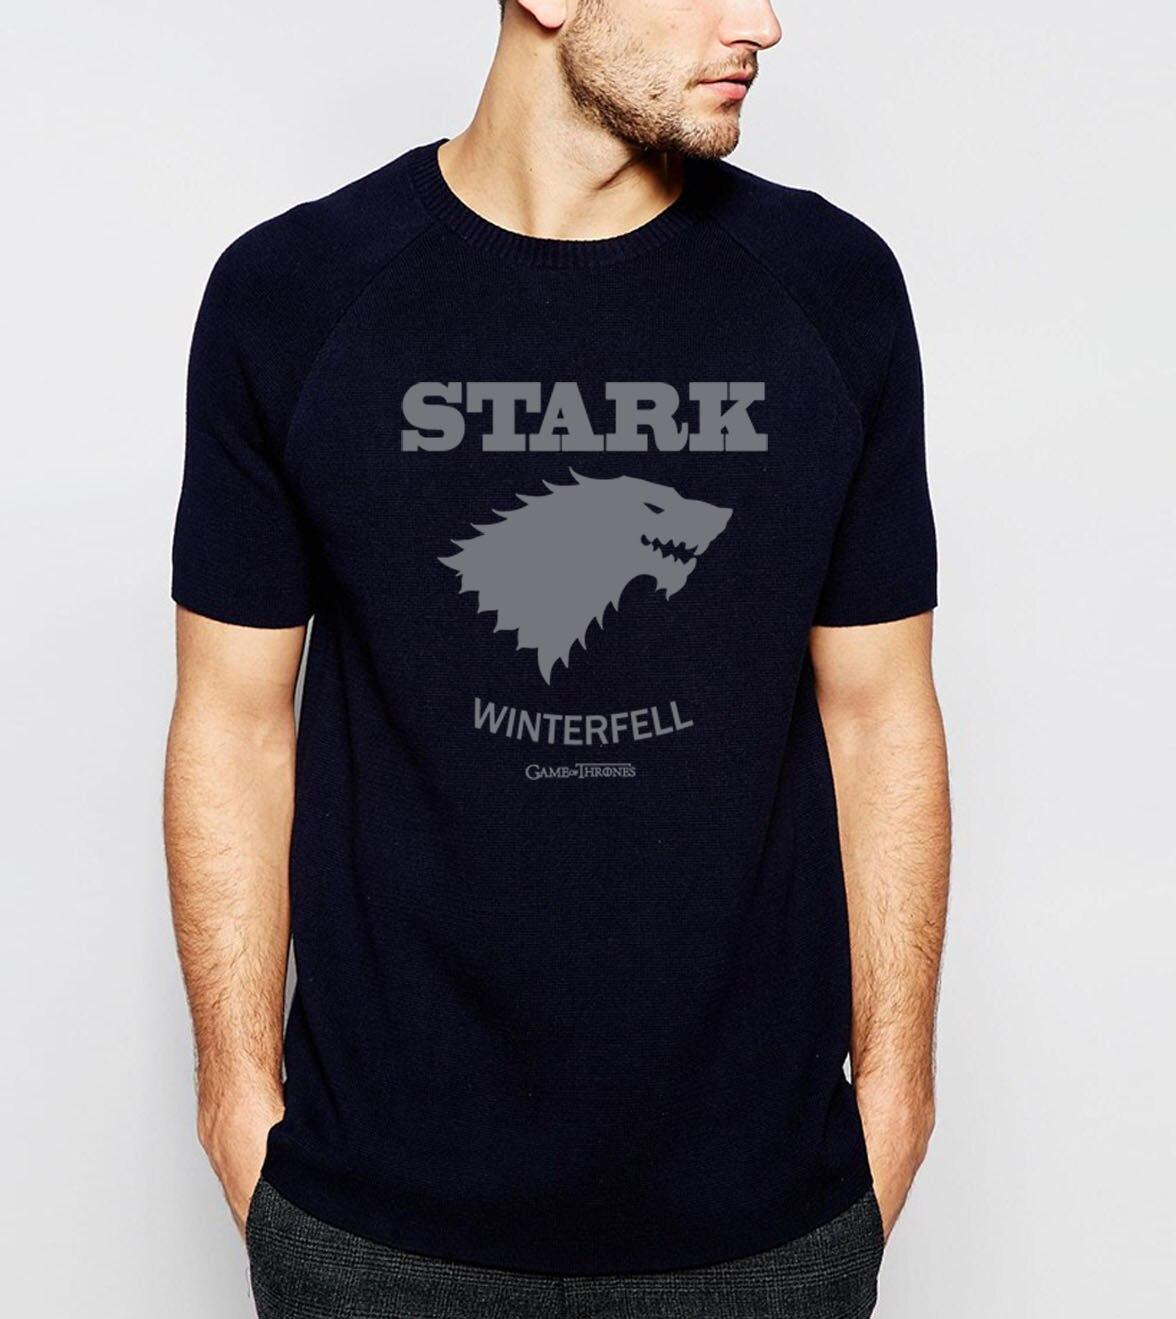 HAMPSON LANQE  Game of Thrones House Stark Winterfell T Shirts Men 2019 Summer 100% Cotton Men's Tops Tees Casual T-Shirt S-XXL